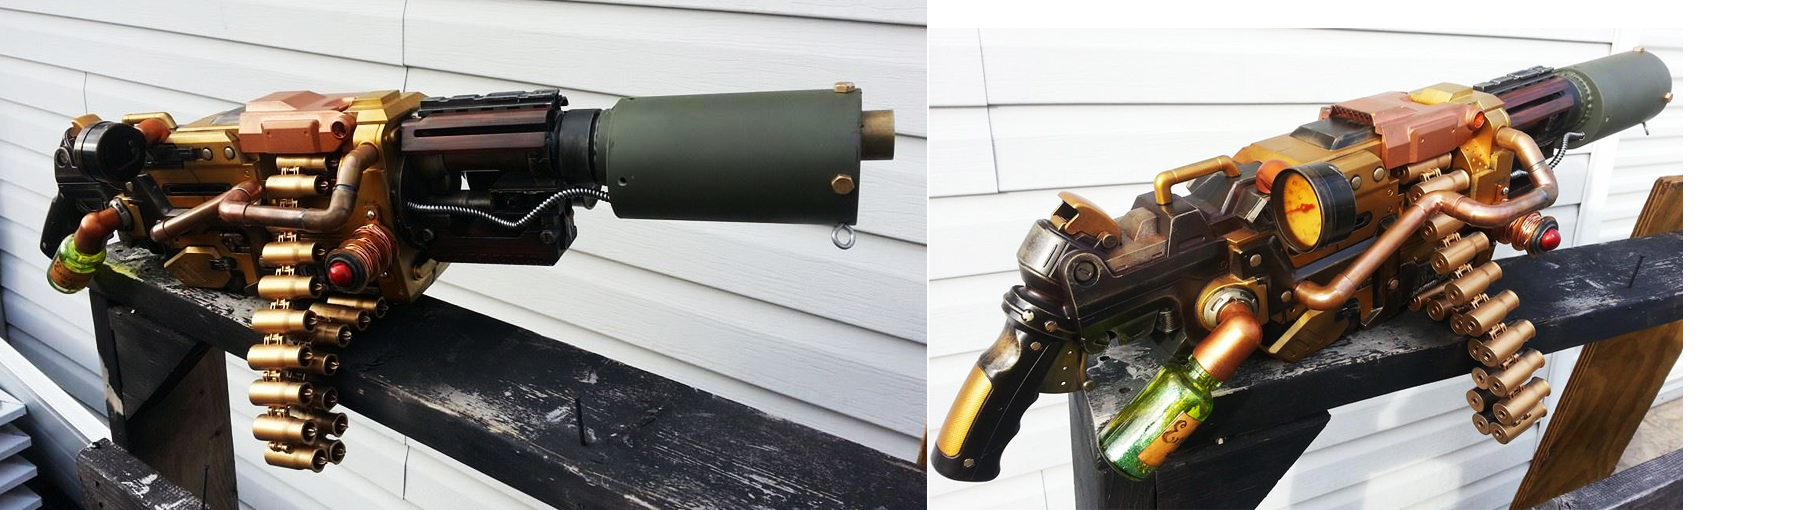 Steampunk Machine Gun Progress 2 by JohnsonArms